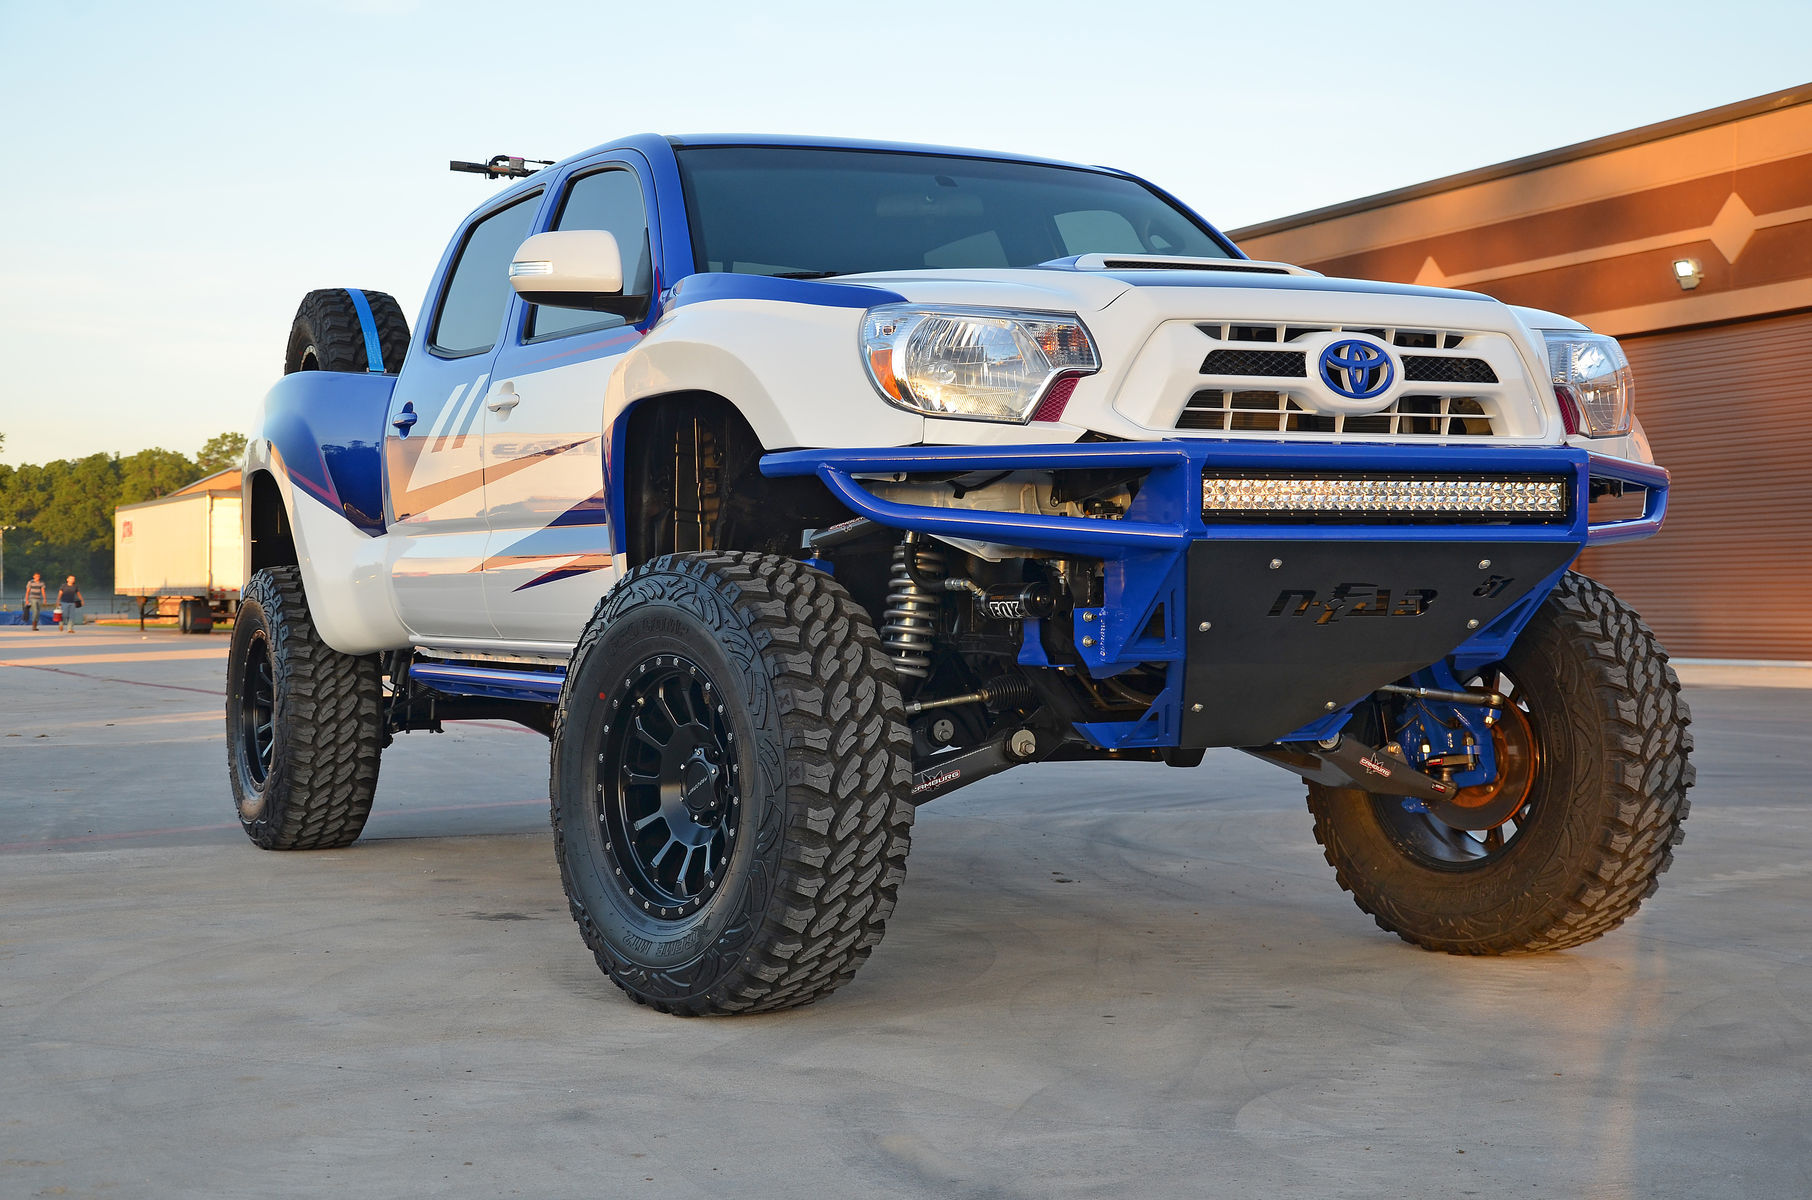 Toyota Tacoma | Justin Barcia's JGR Build